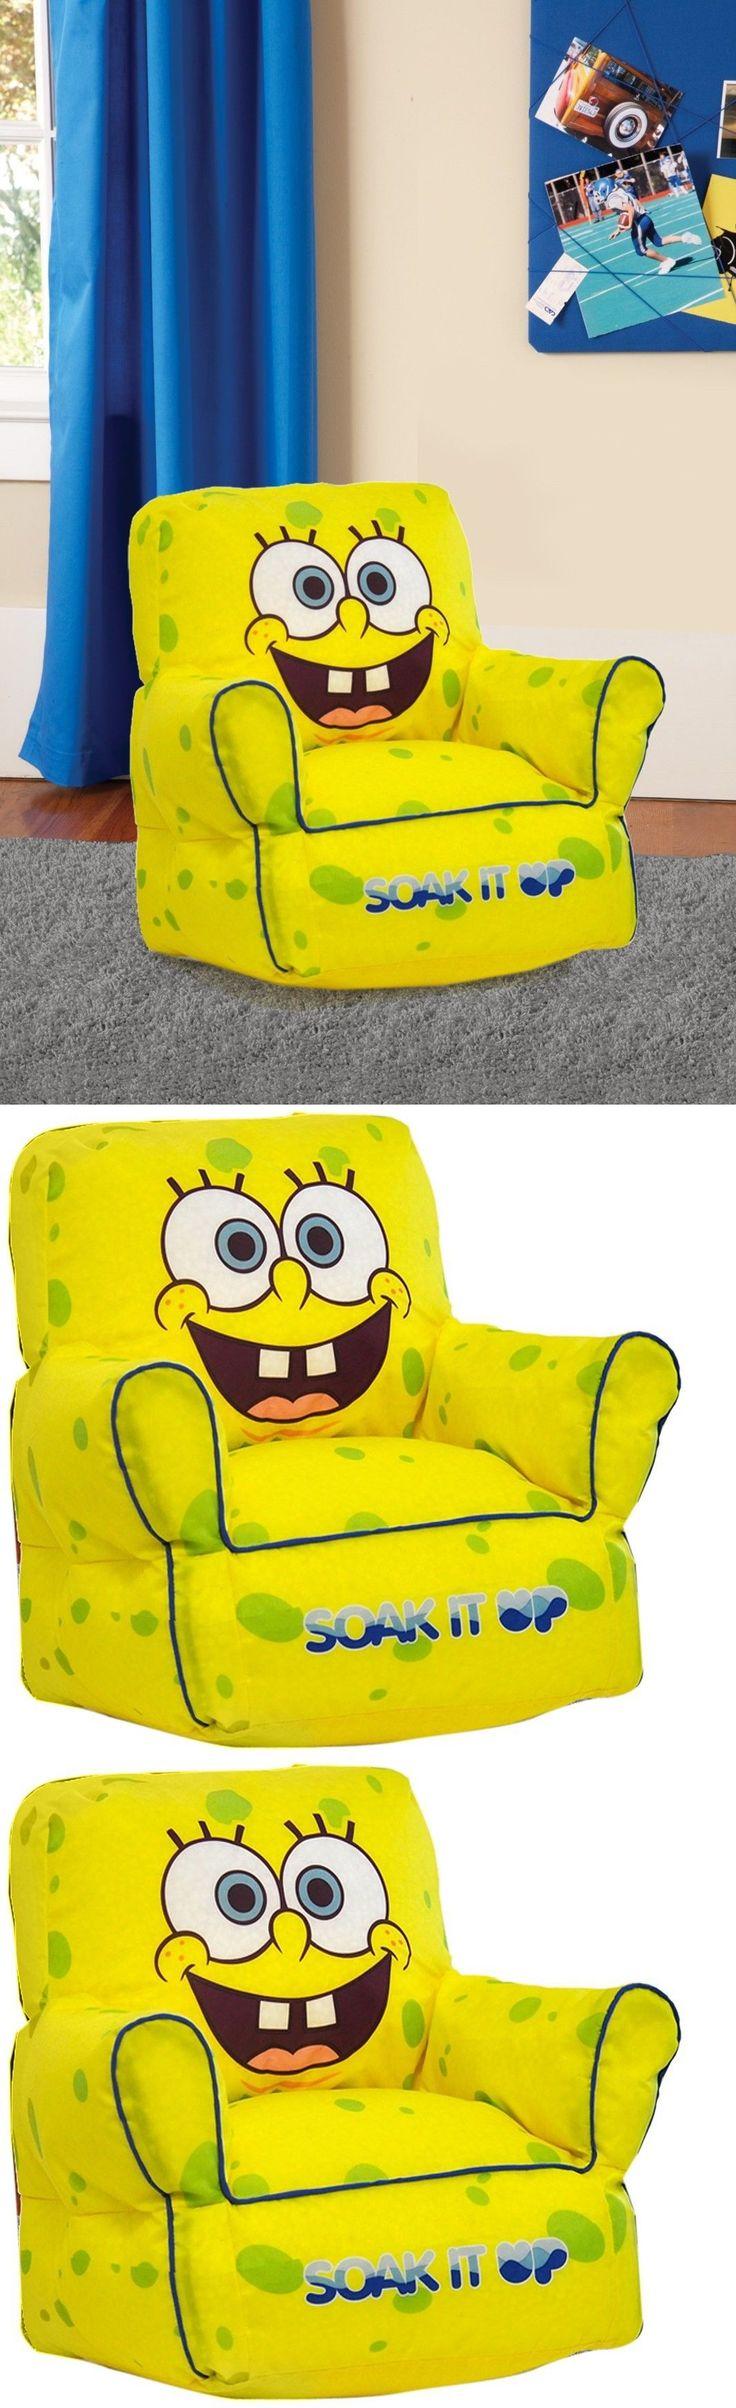 Big joe zip modular armless chair at brookstone buy now - Spongebob Squarepants 20919 Spongebob Squarepants Bean Bag Sofa Chair Easy To Clean Light Weight